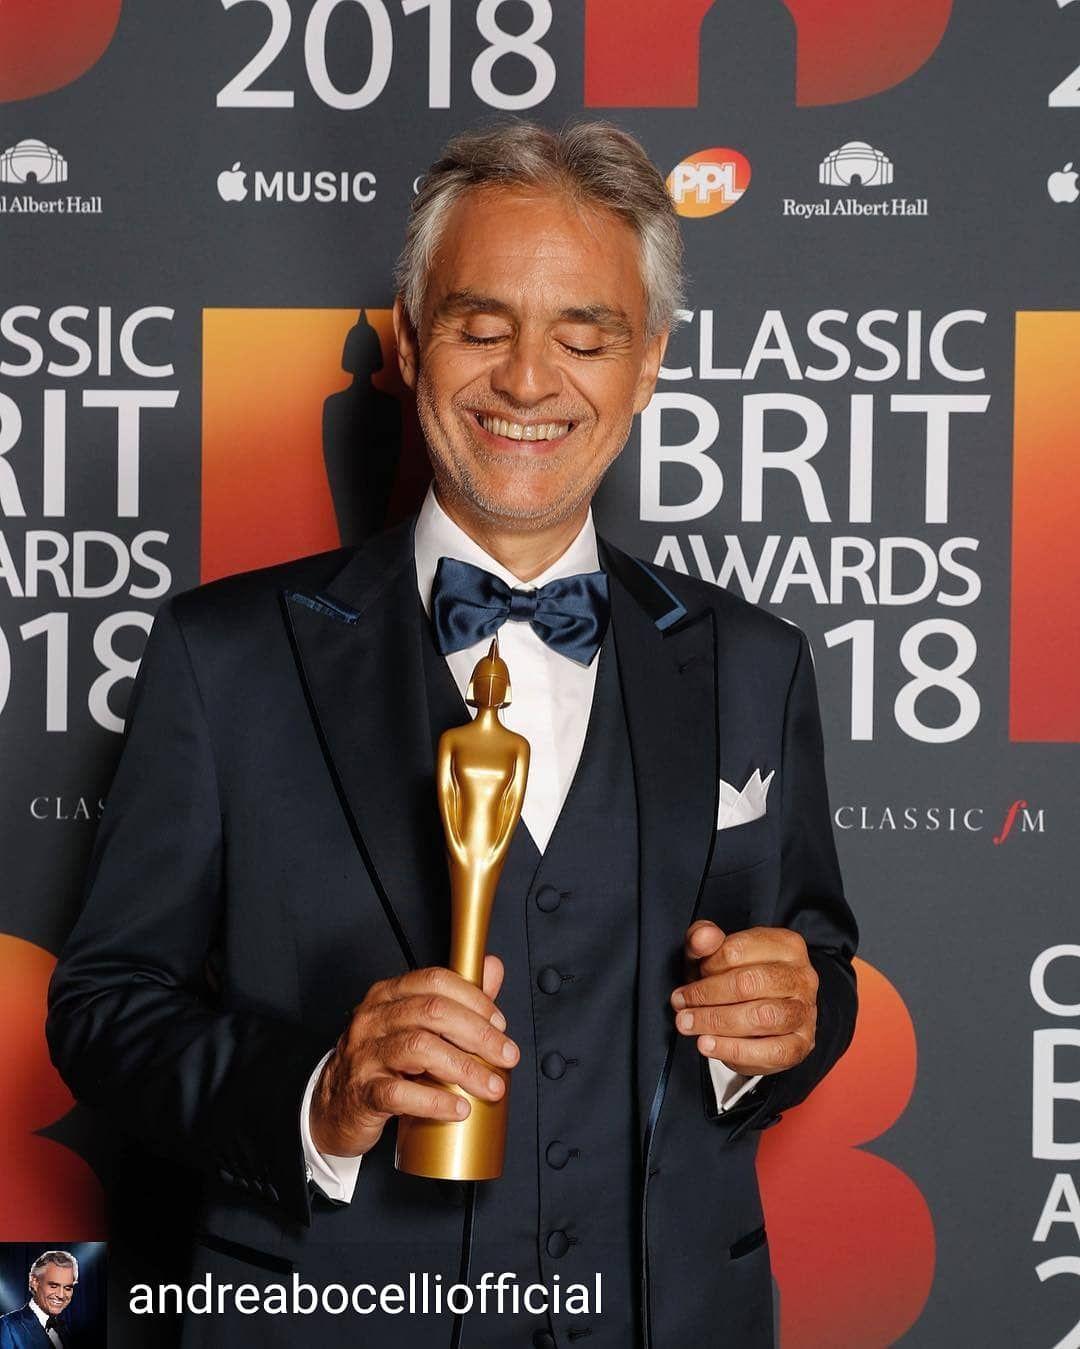 13 06 2018 Classic Brit Awards 2018 Classic Brits Icon 2018